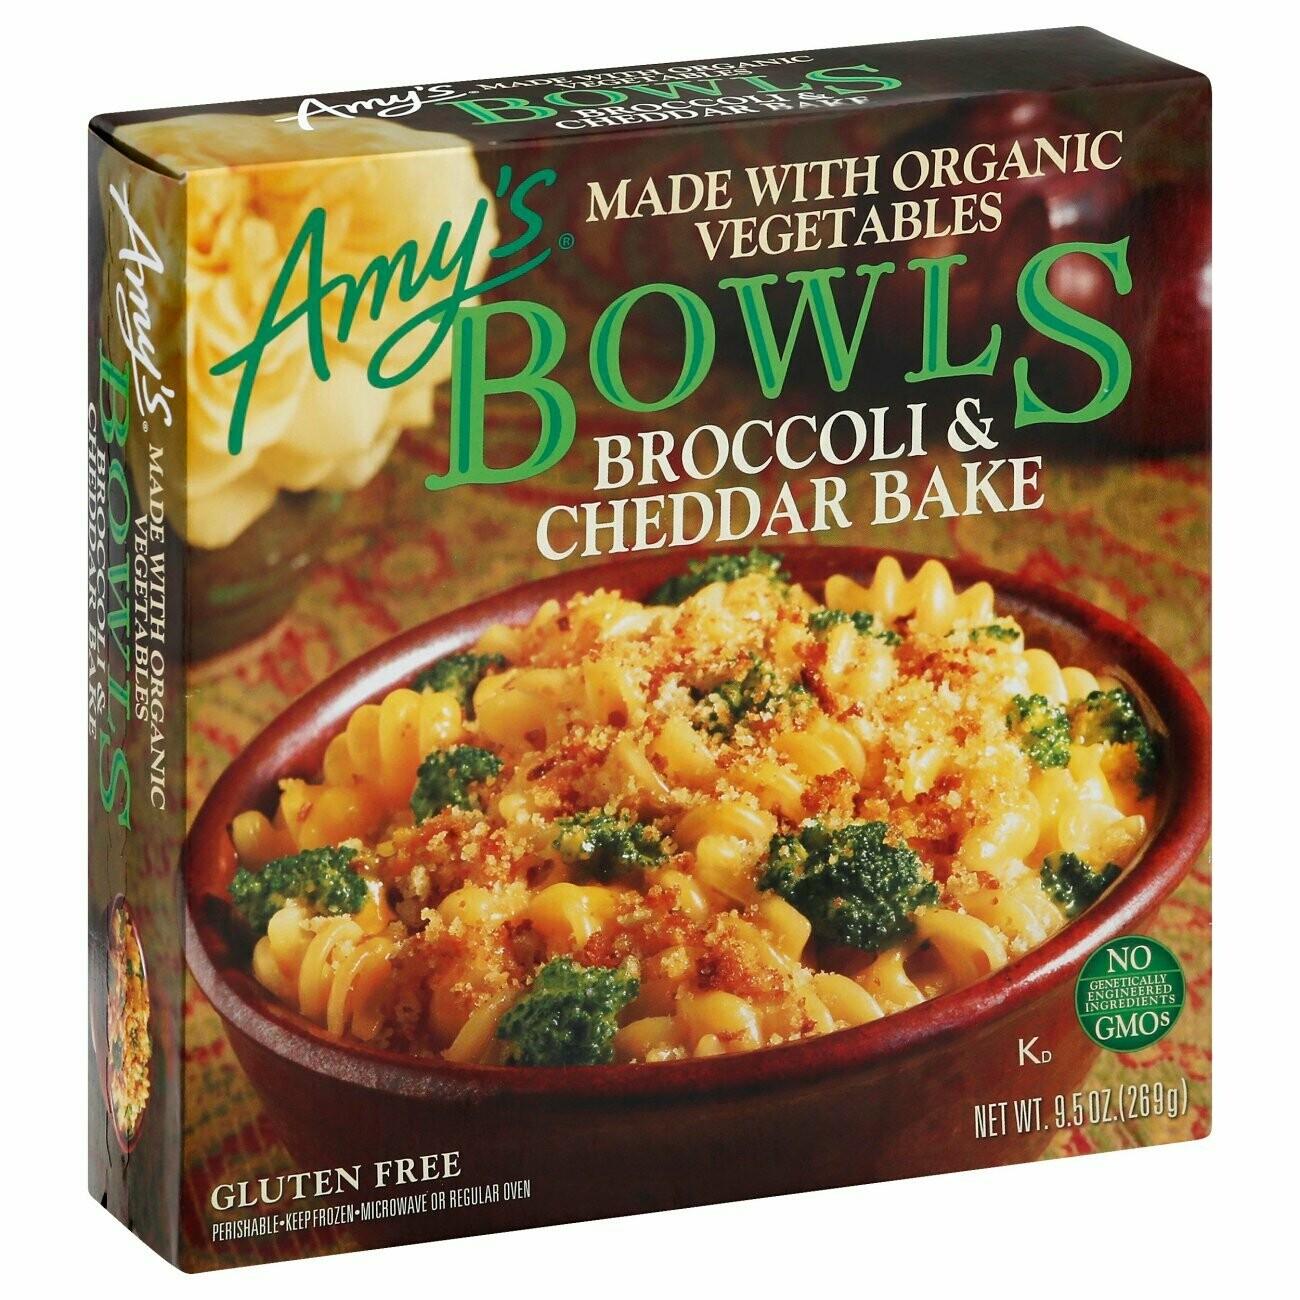 Amy's Broccoli & Cheddar Bake Bowl